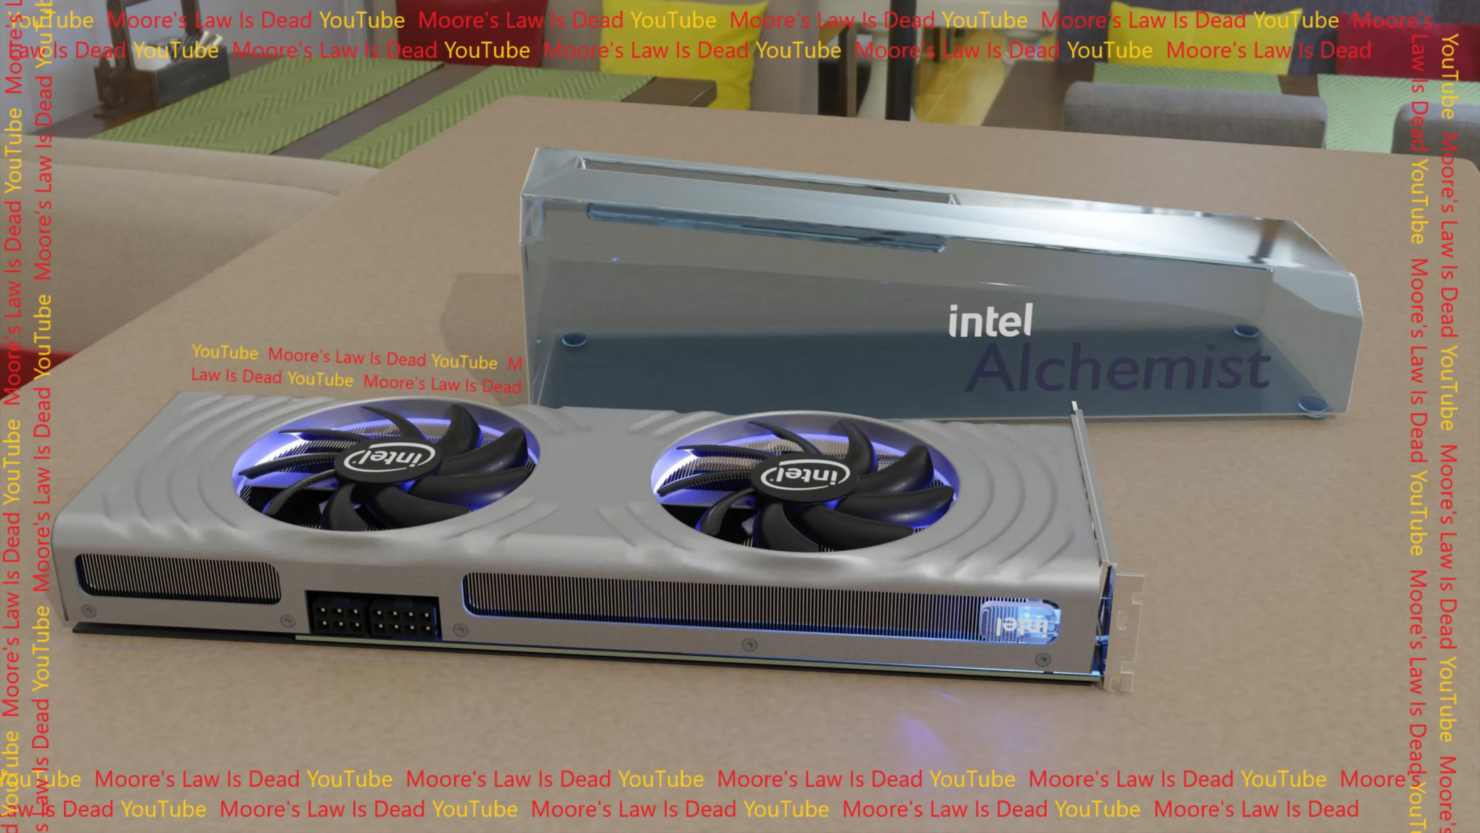 intel-arc-alchemist-reference-graphics-card-final-design-renders-_5